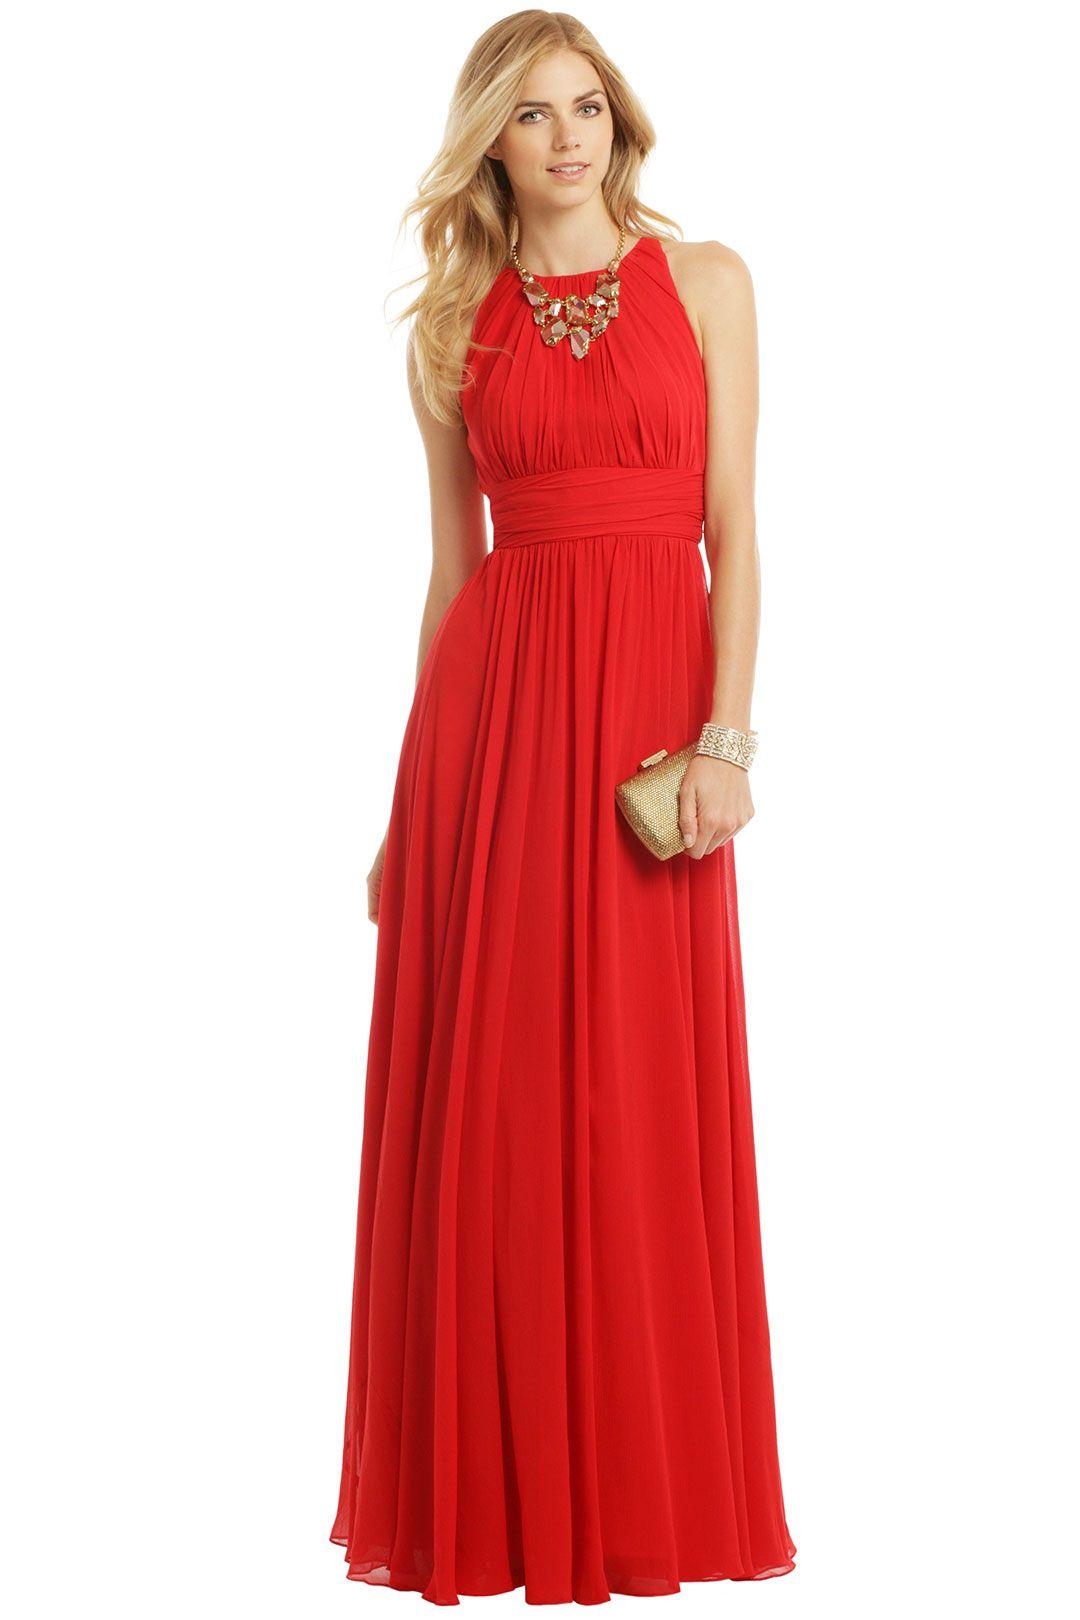 Badgley mischka ruby red gala gown utopya con dress ideas